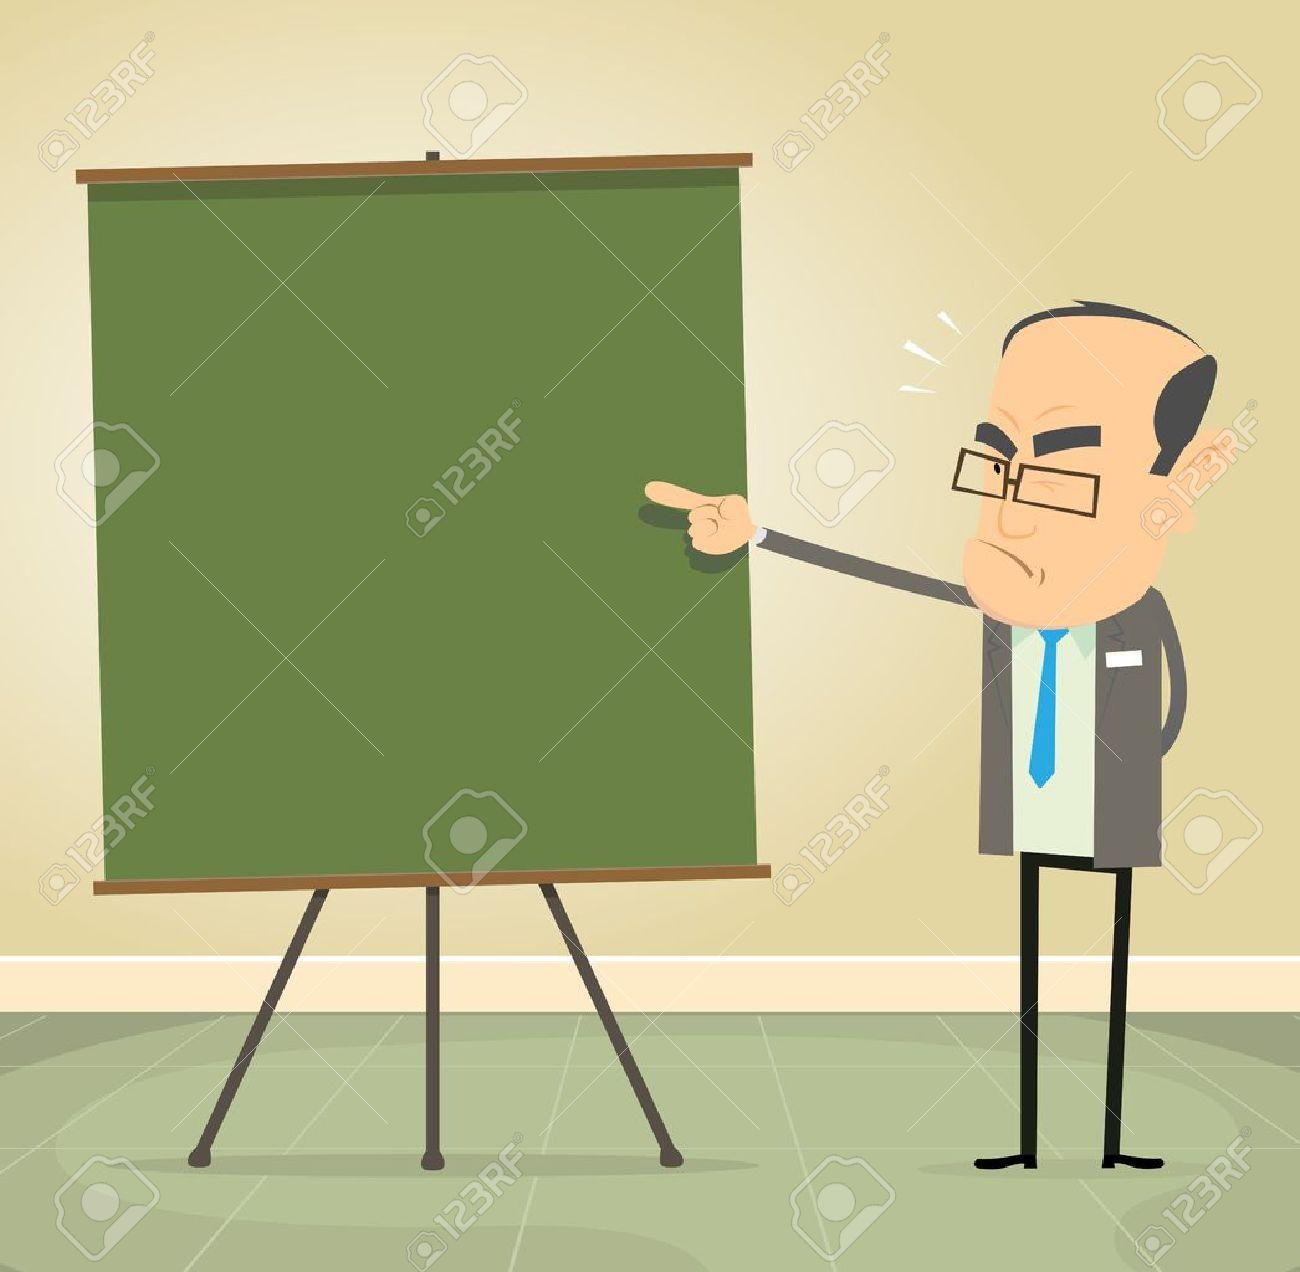 Illustration of a cartoon old school teacher teaching moral values